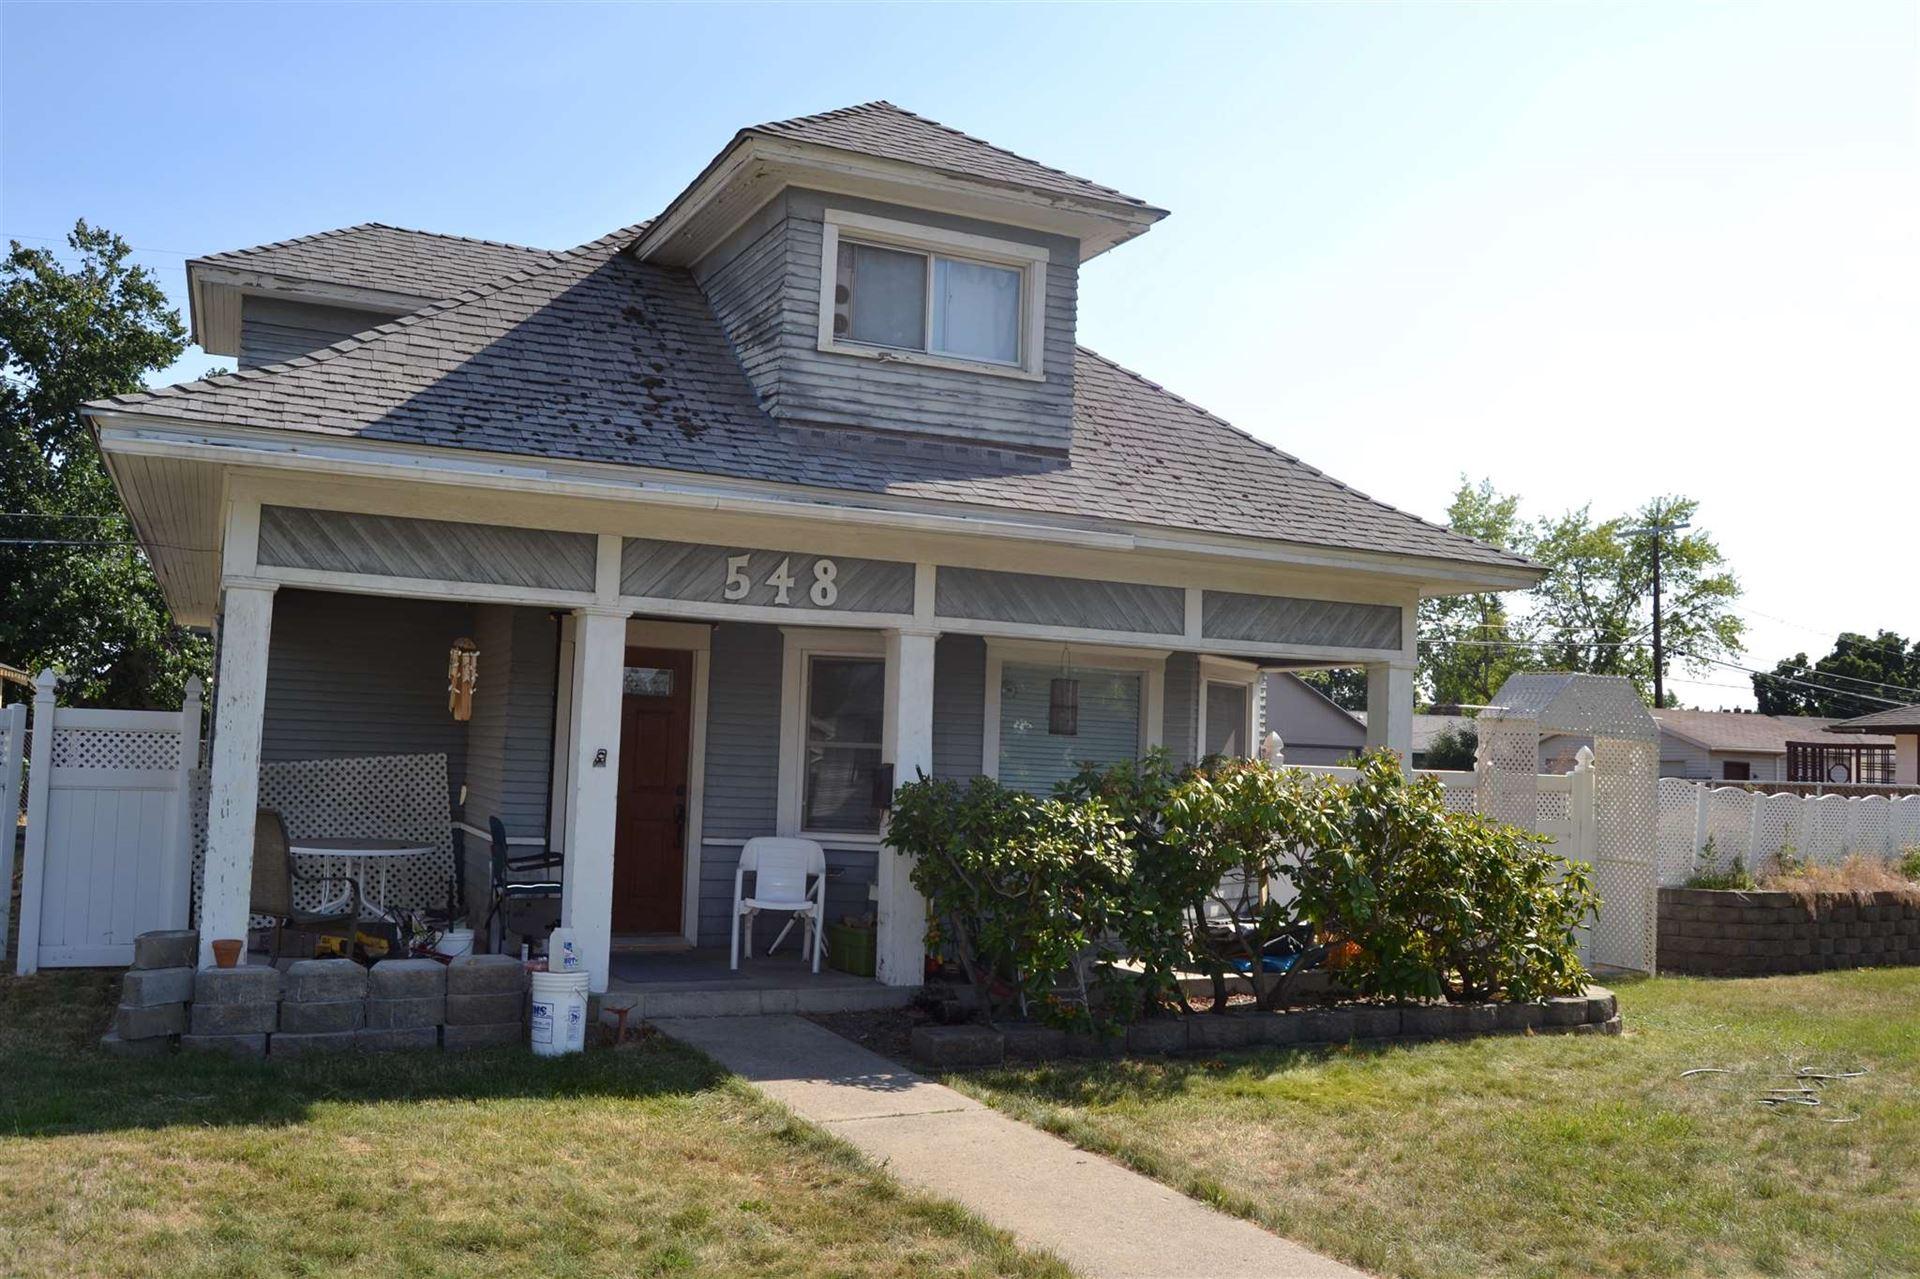 548 E Heroy Ave, Spokane, WA 99207 - #: 202118749